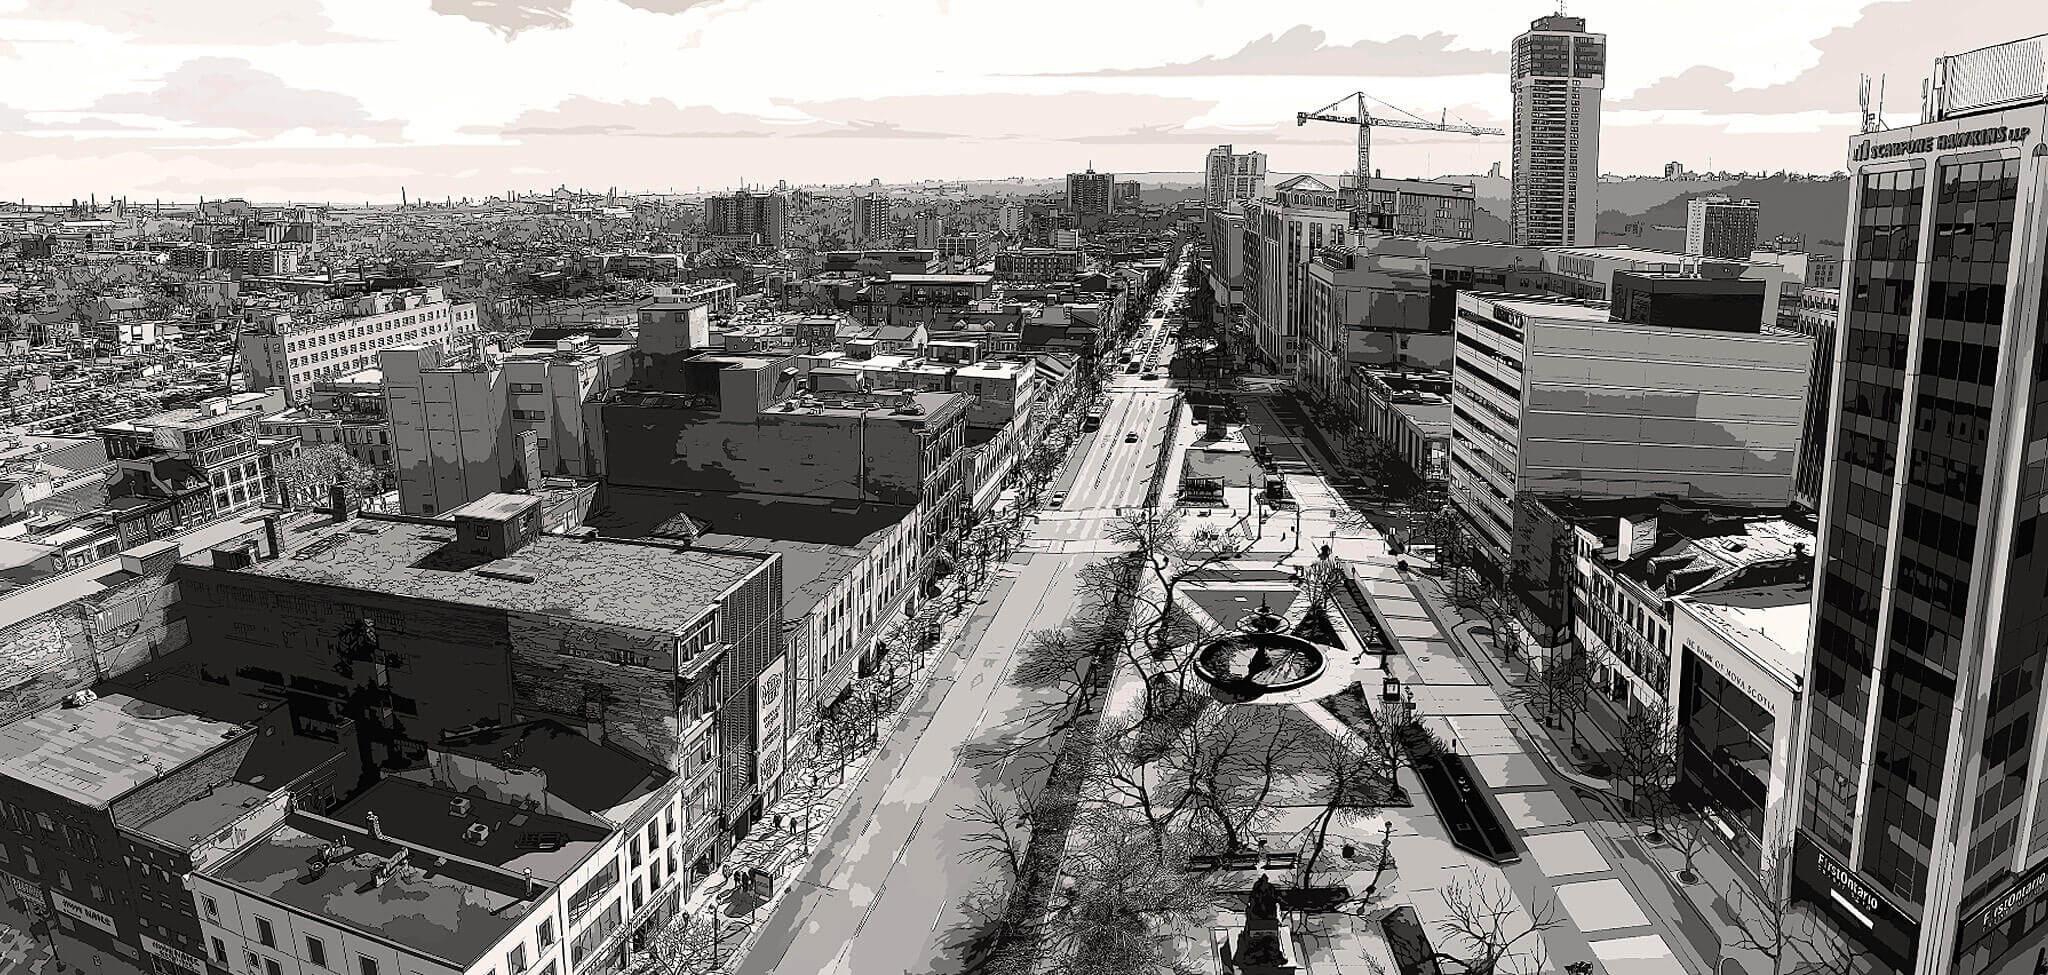 Art Gallery of Hamilton - The Shifting City